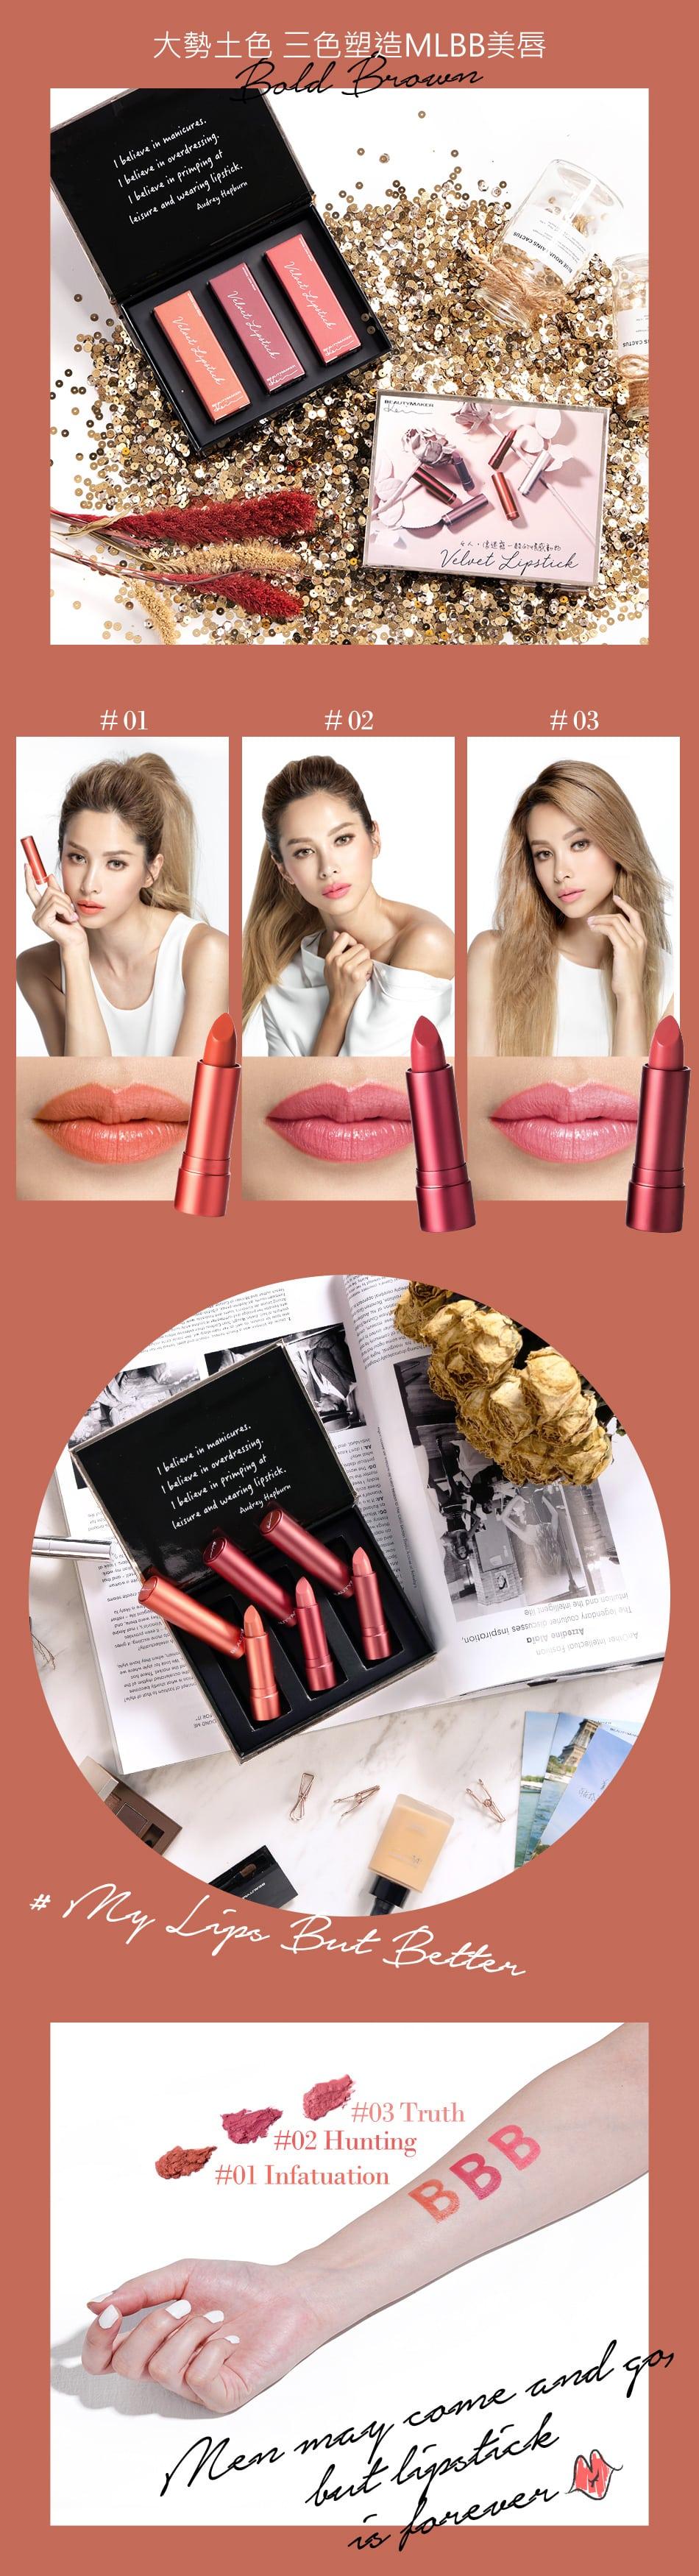 Long-Wear Velvet Lipstick - Product Color Swatch